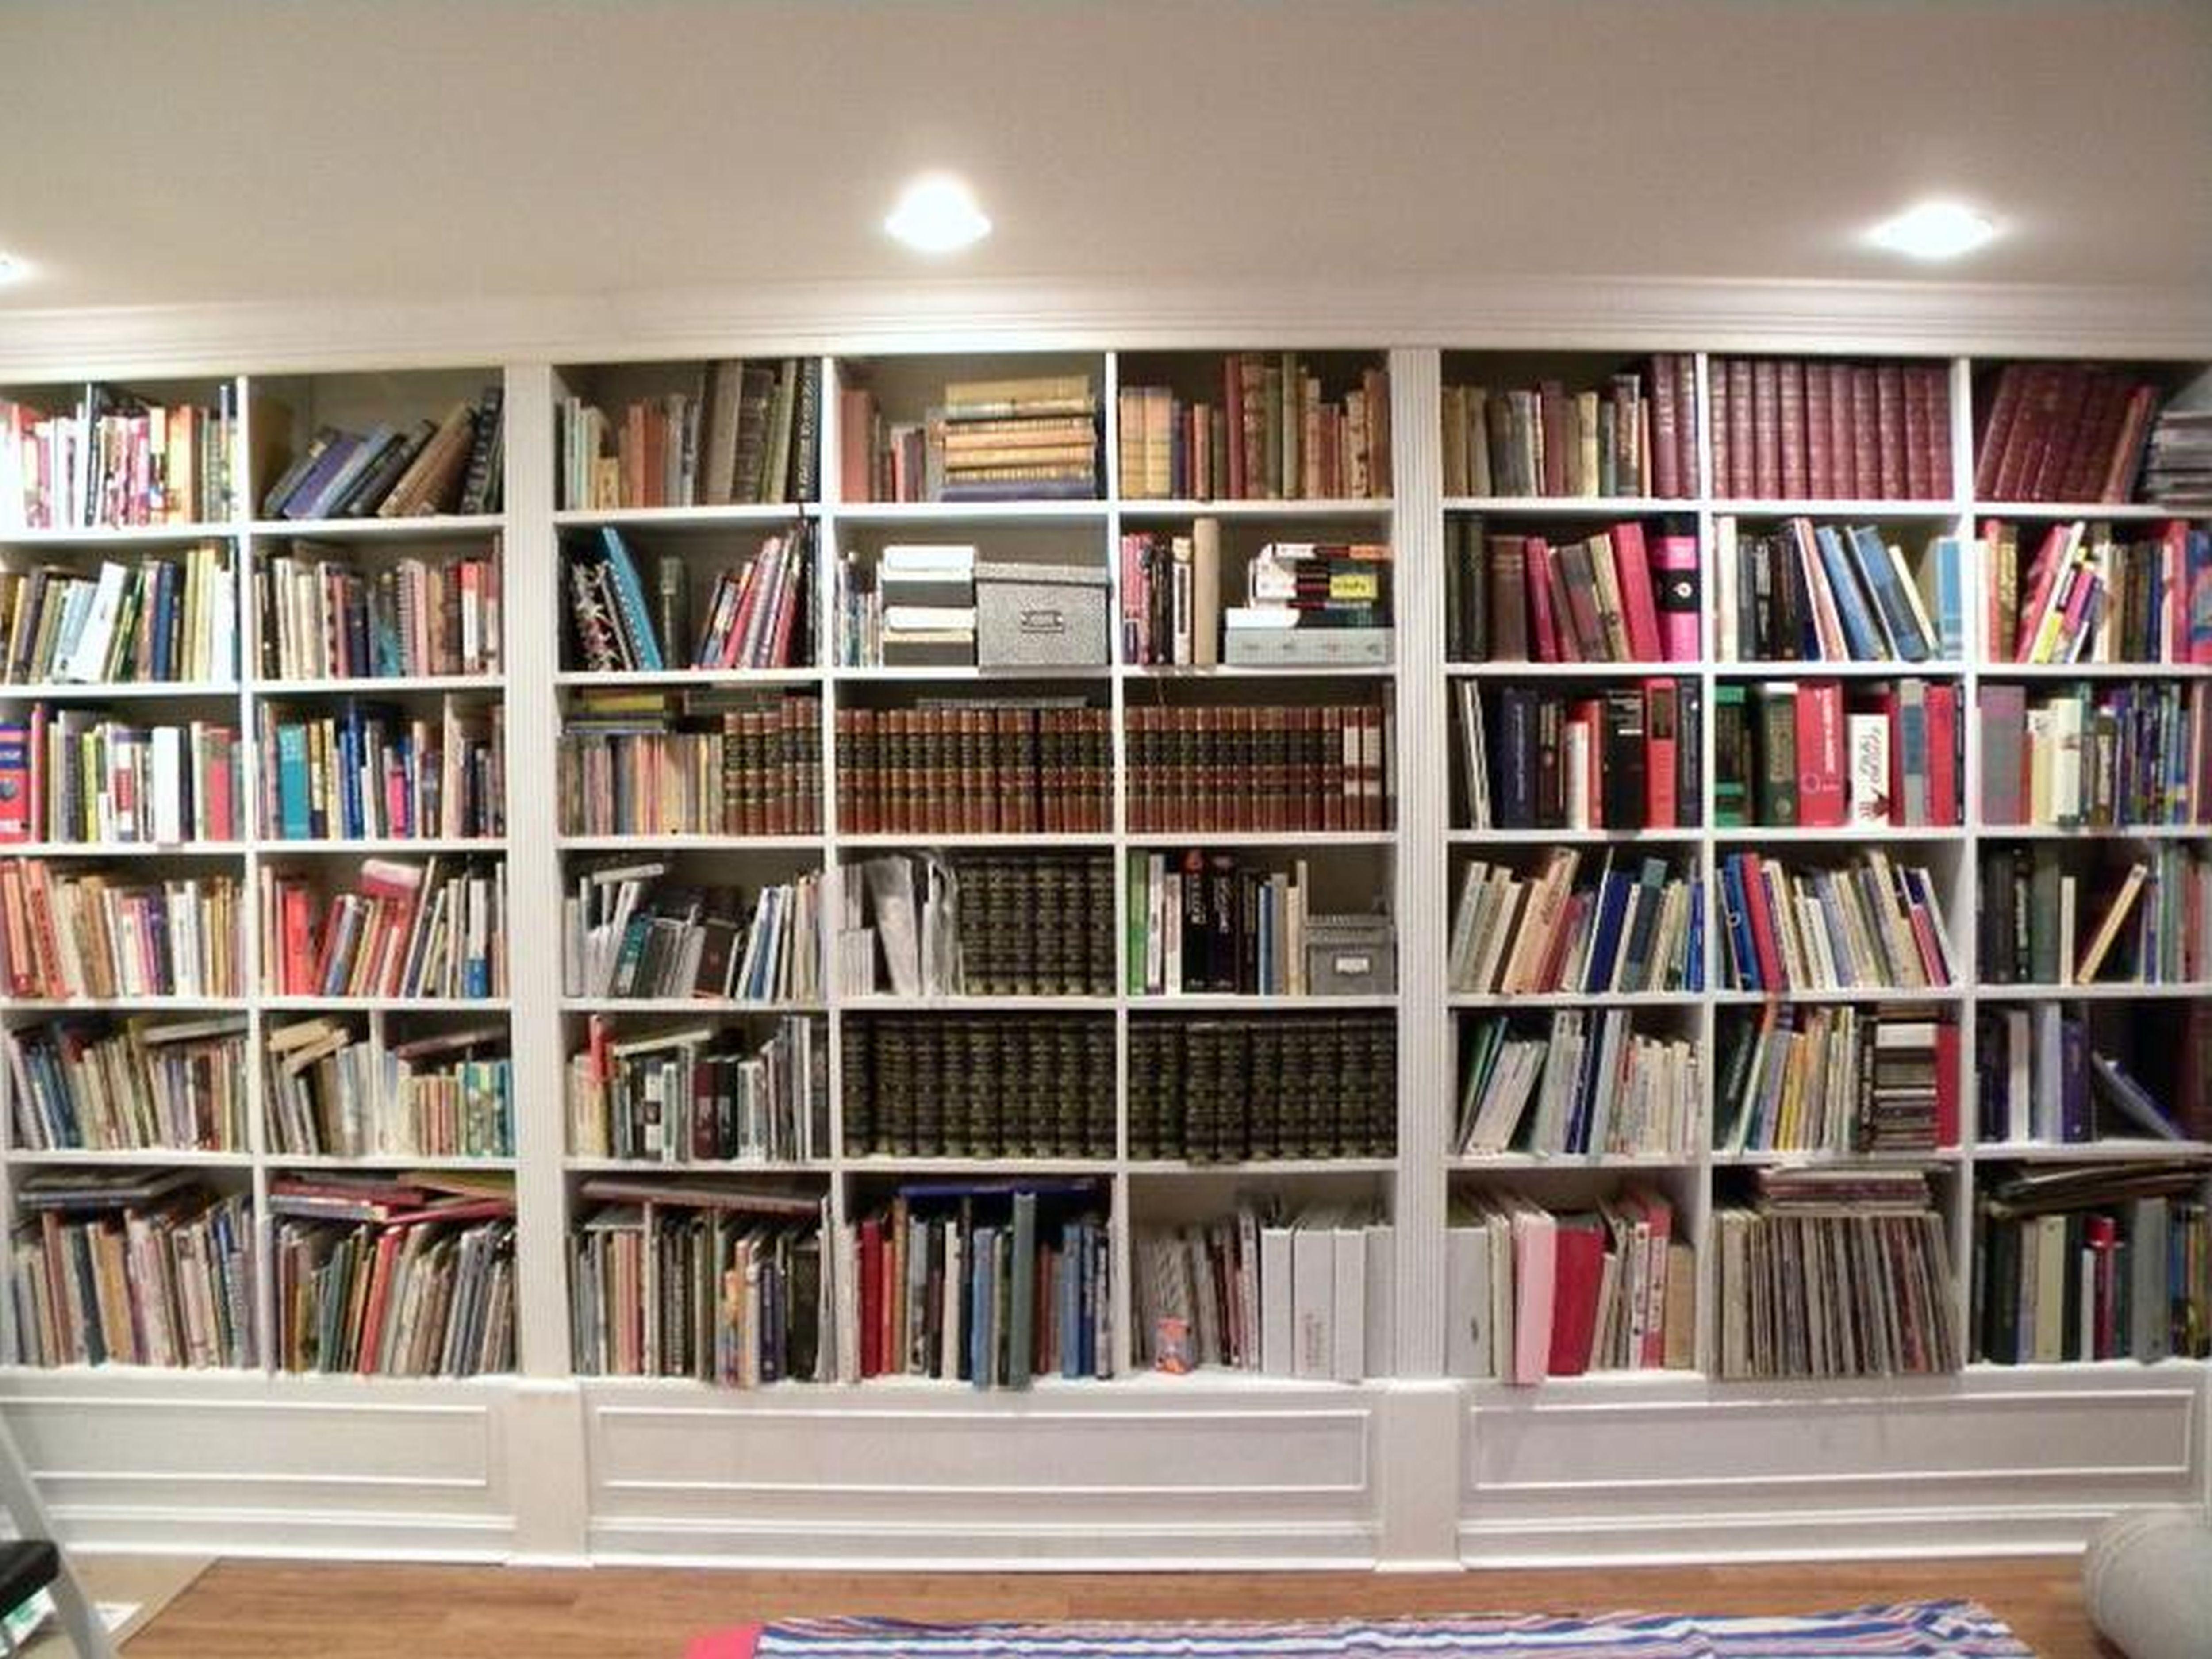 Gorgeous White Wooden Built In Large Bookshelf Ideas For Home In Full Wall Bookshelf (View 8 of 11)